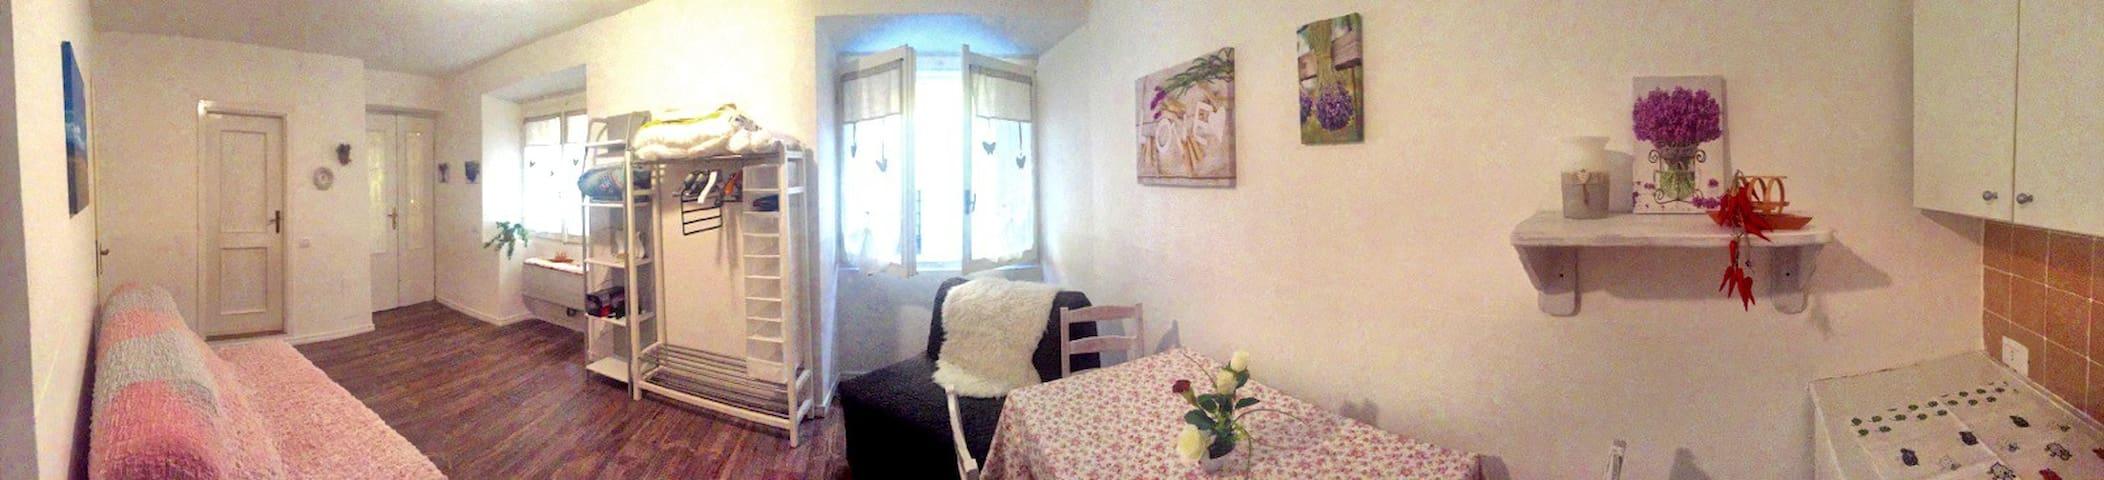 Sun&Moon Little Home - Varenna - Huis